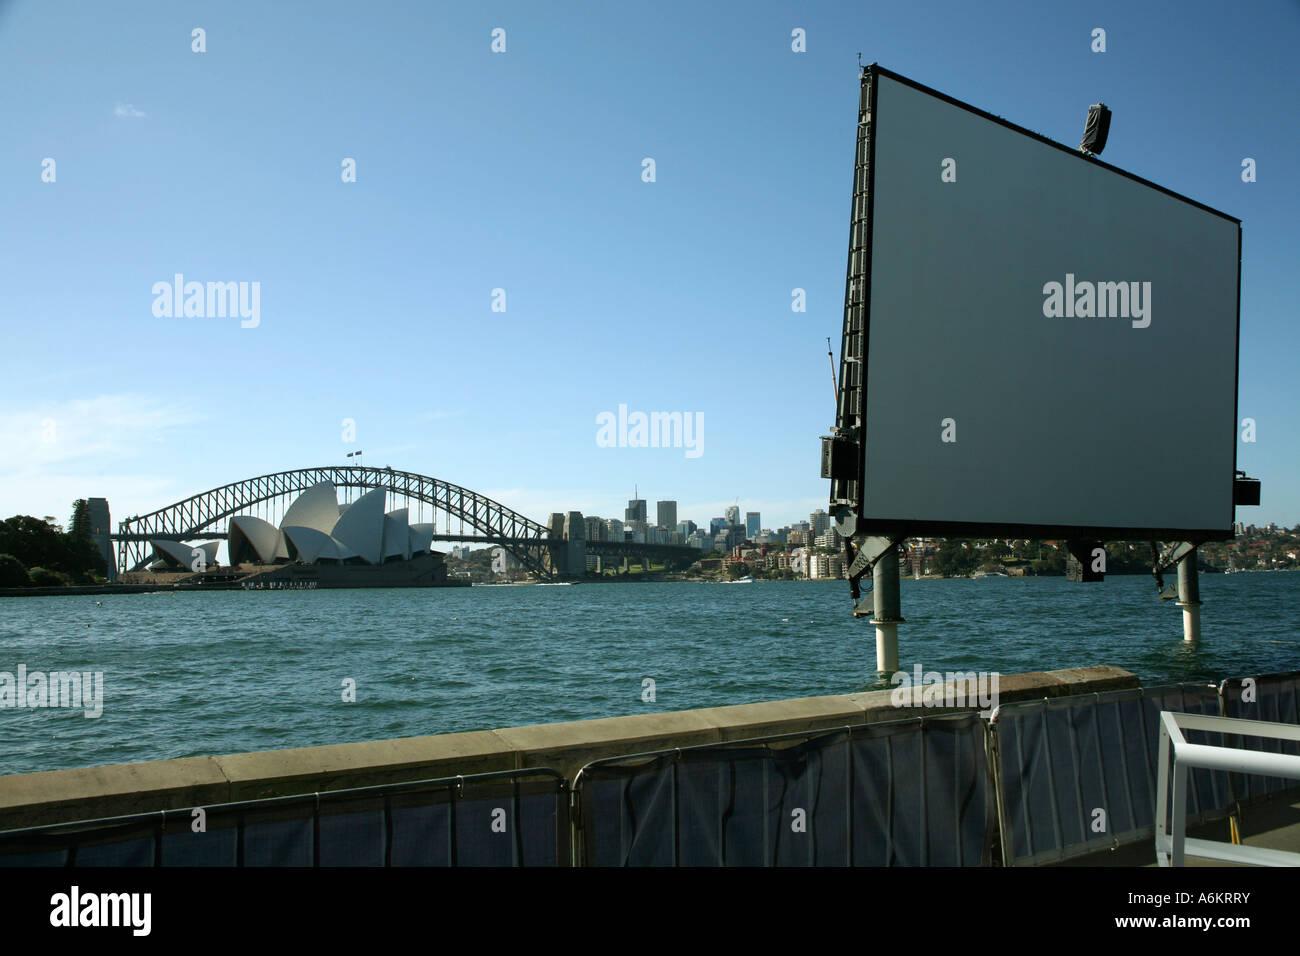 Open Air Cinema Screen, Sydney, Australia, January 2007 - Stock Image